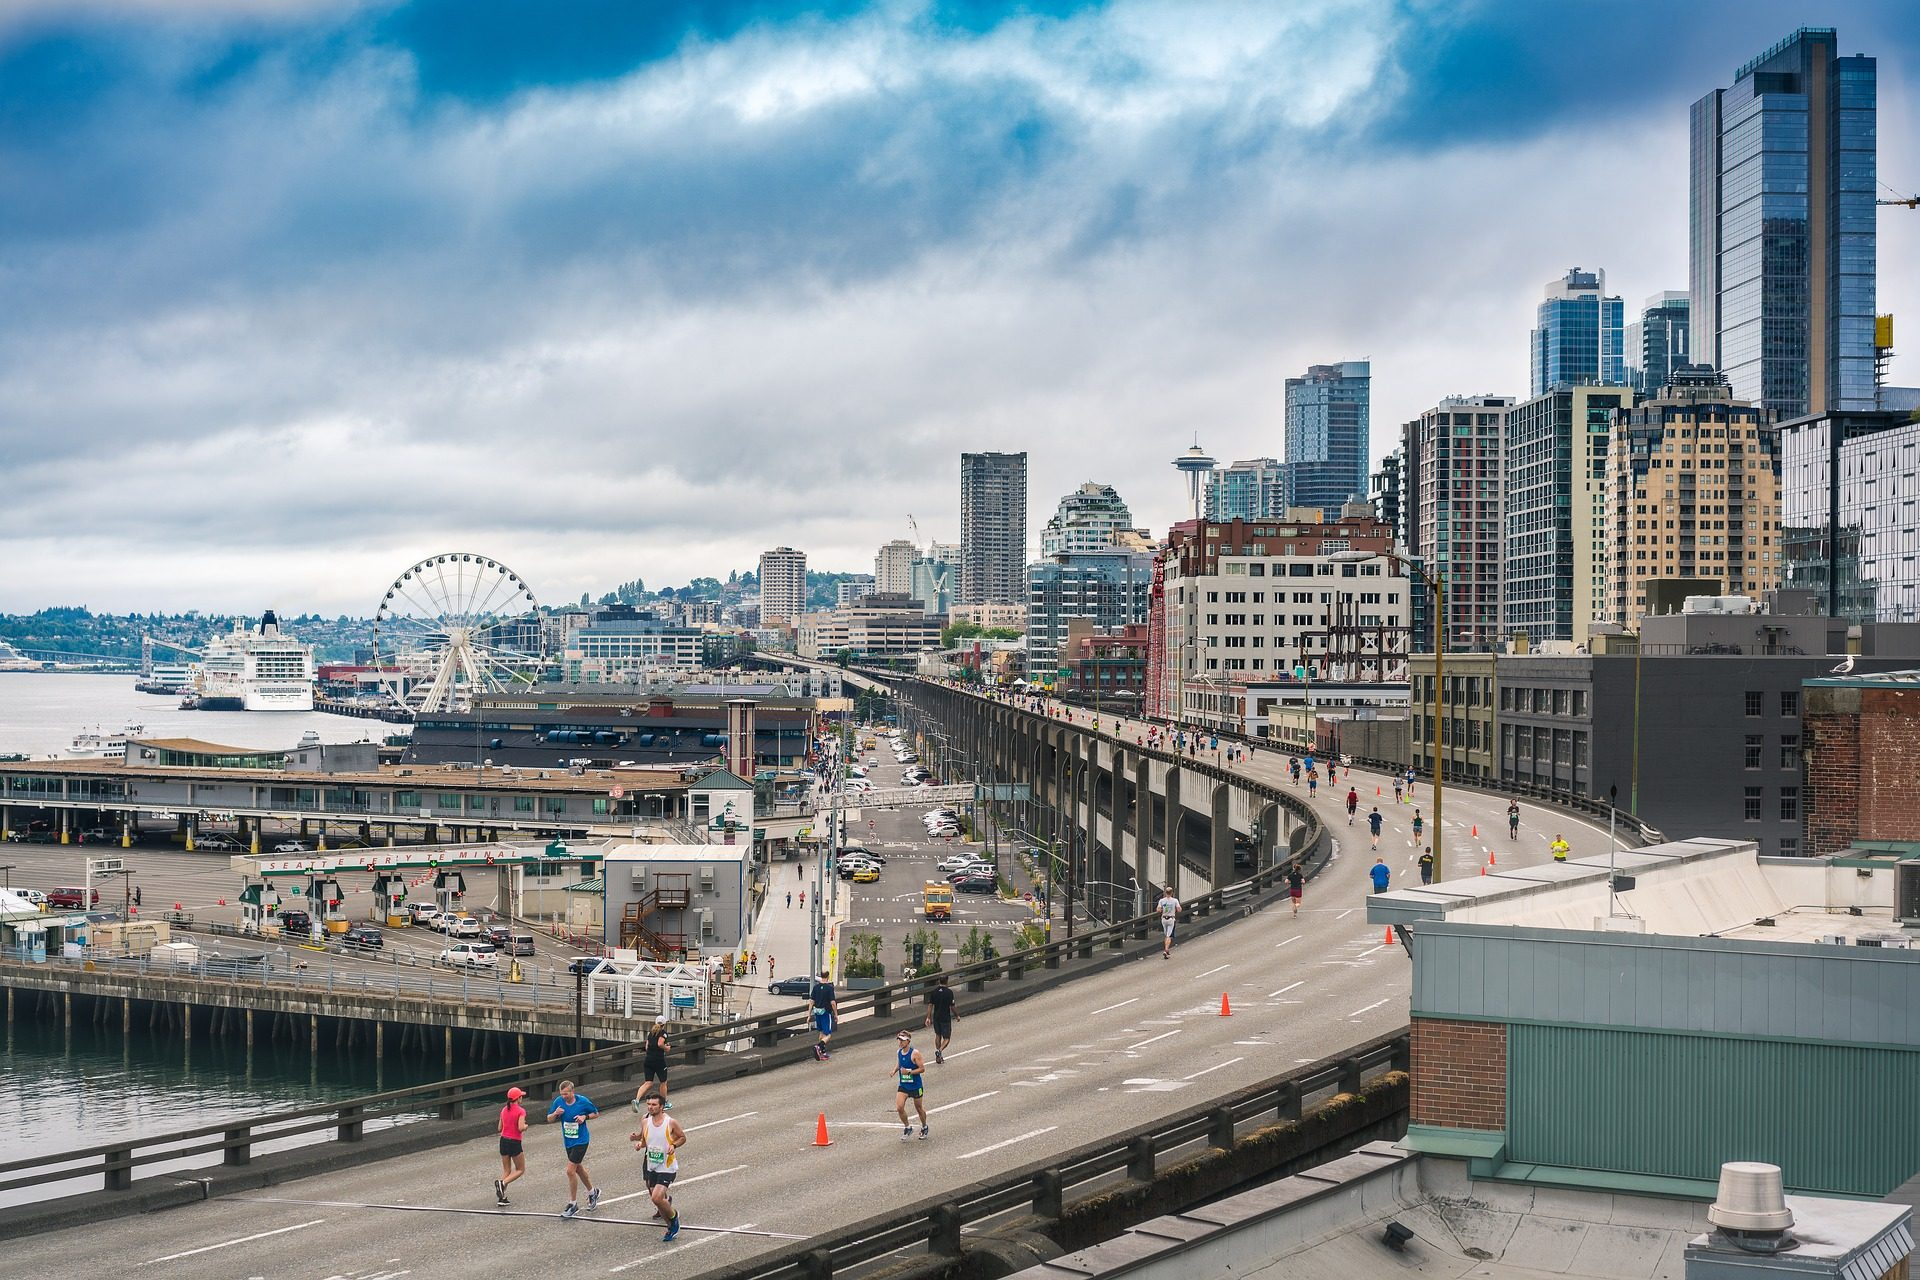 Città, carriera, Maratona, Broker, edifici, Seattle - Sfondi HD - Professor-falken.com